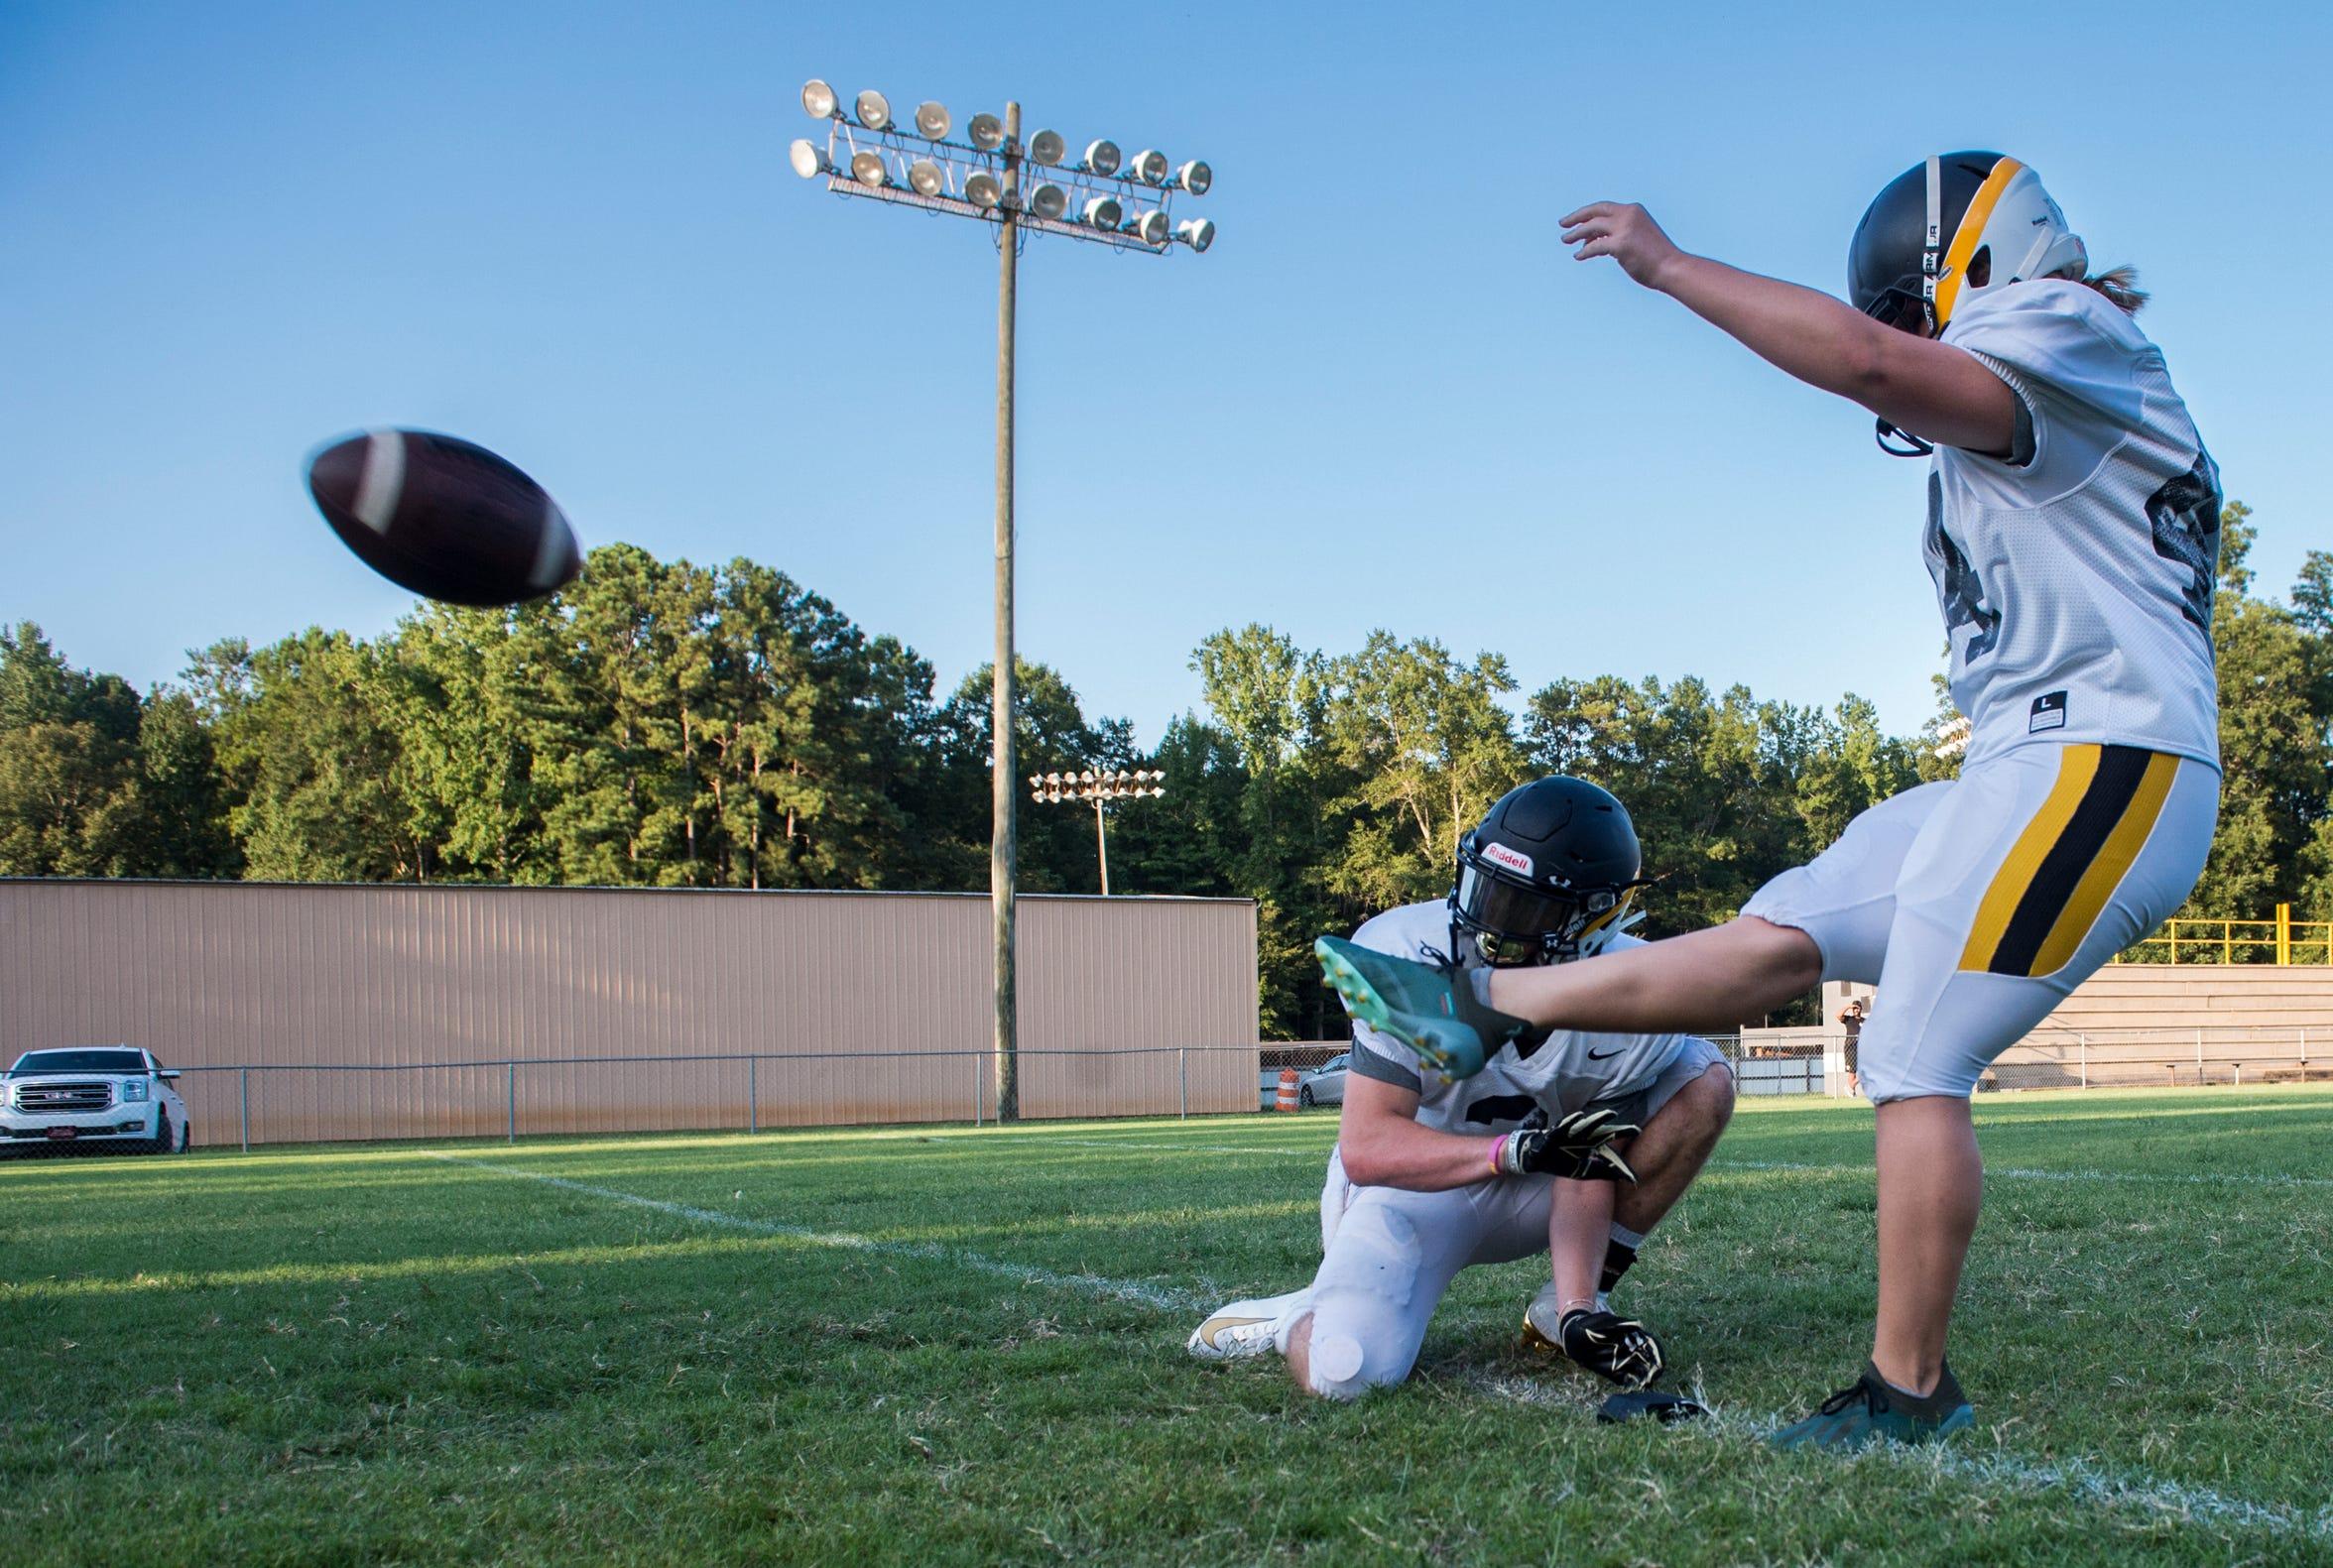 Kicker Emma Wendland kicks a field goal during football practice at Autauga Academy in Prattville, Ala., on Thursday, Aug. 15, 2019.